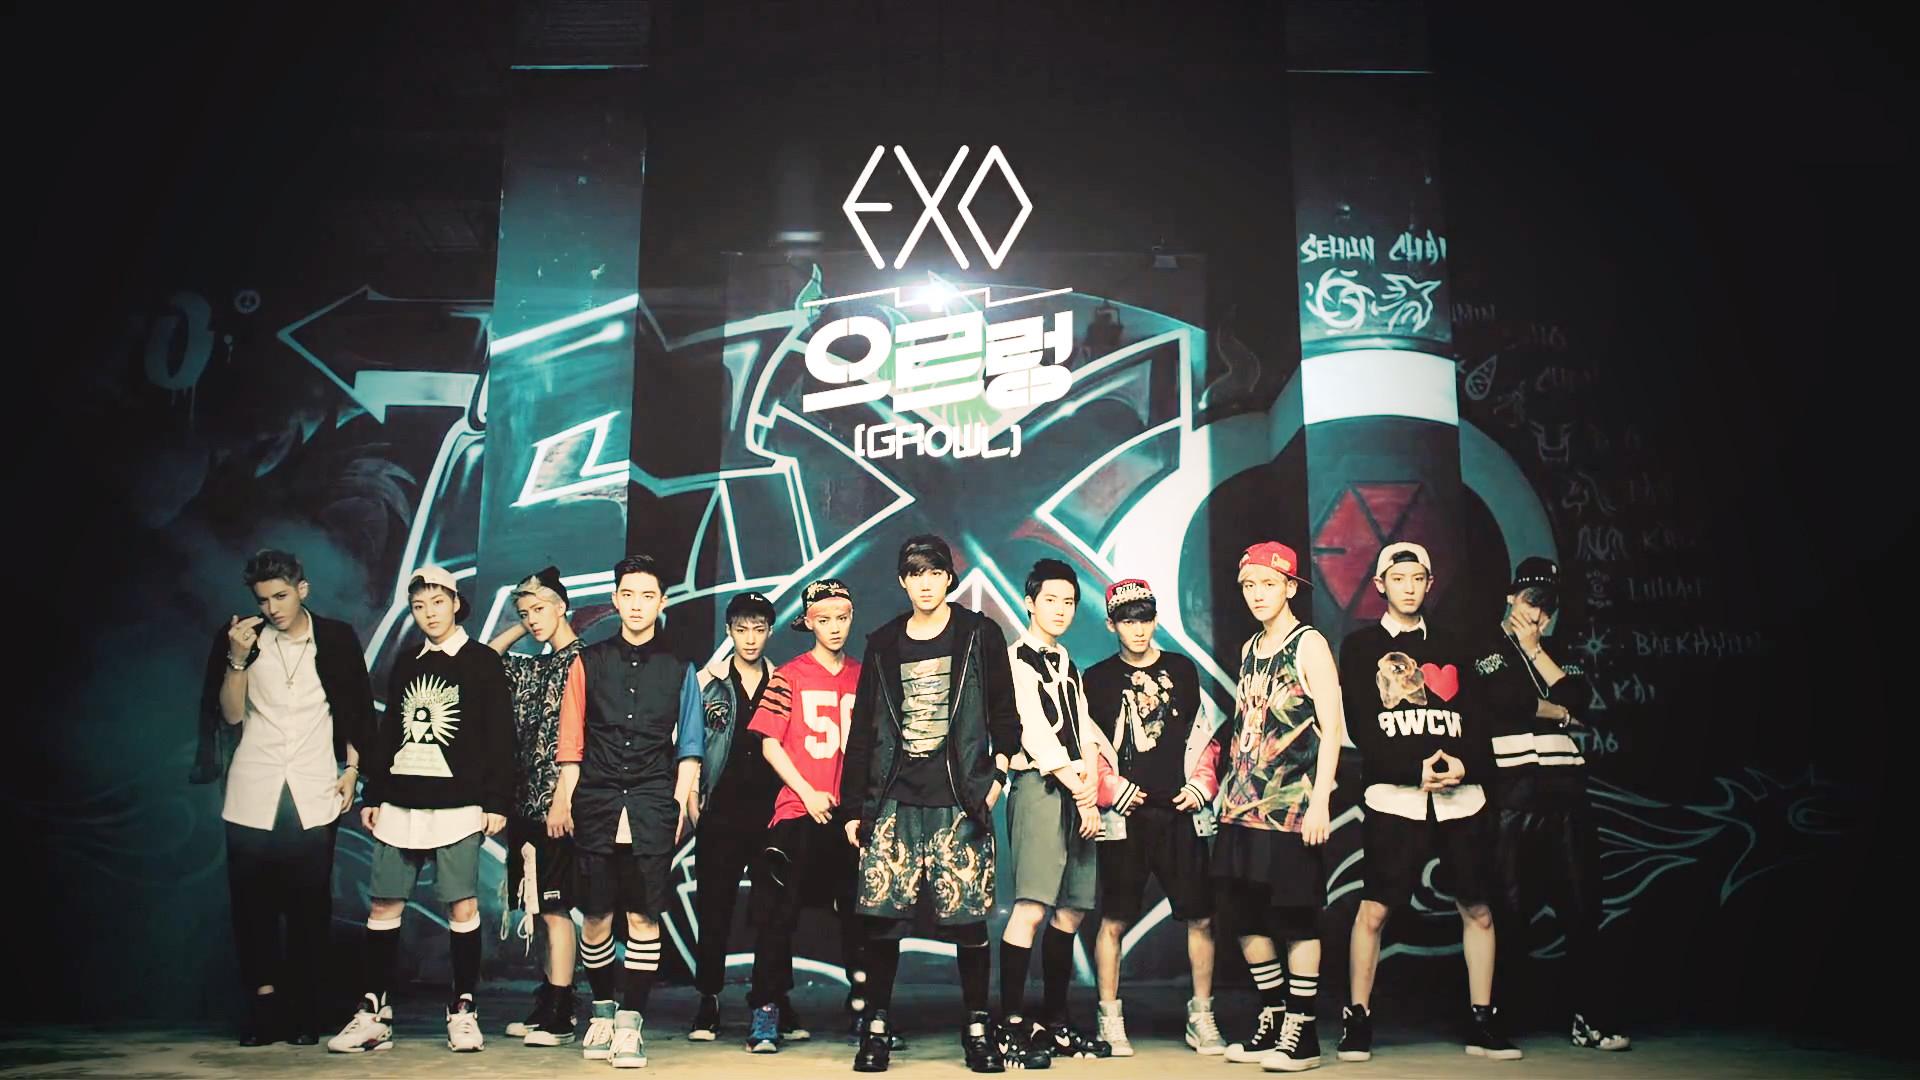 Amazing Exo Wallpaper HD #9591 Wallpaper | WallpaperLepi